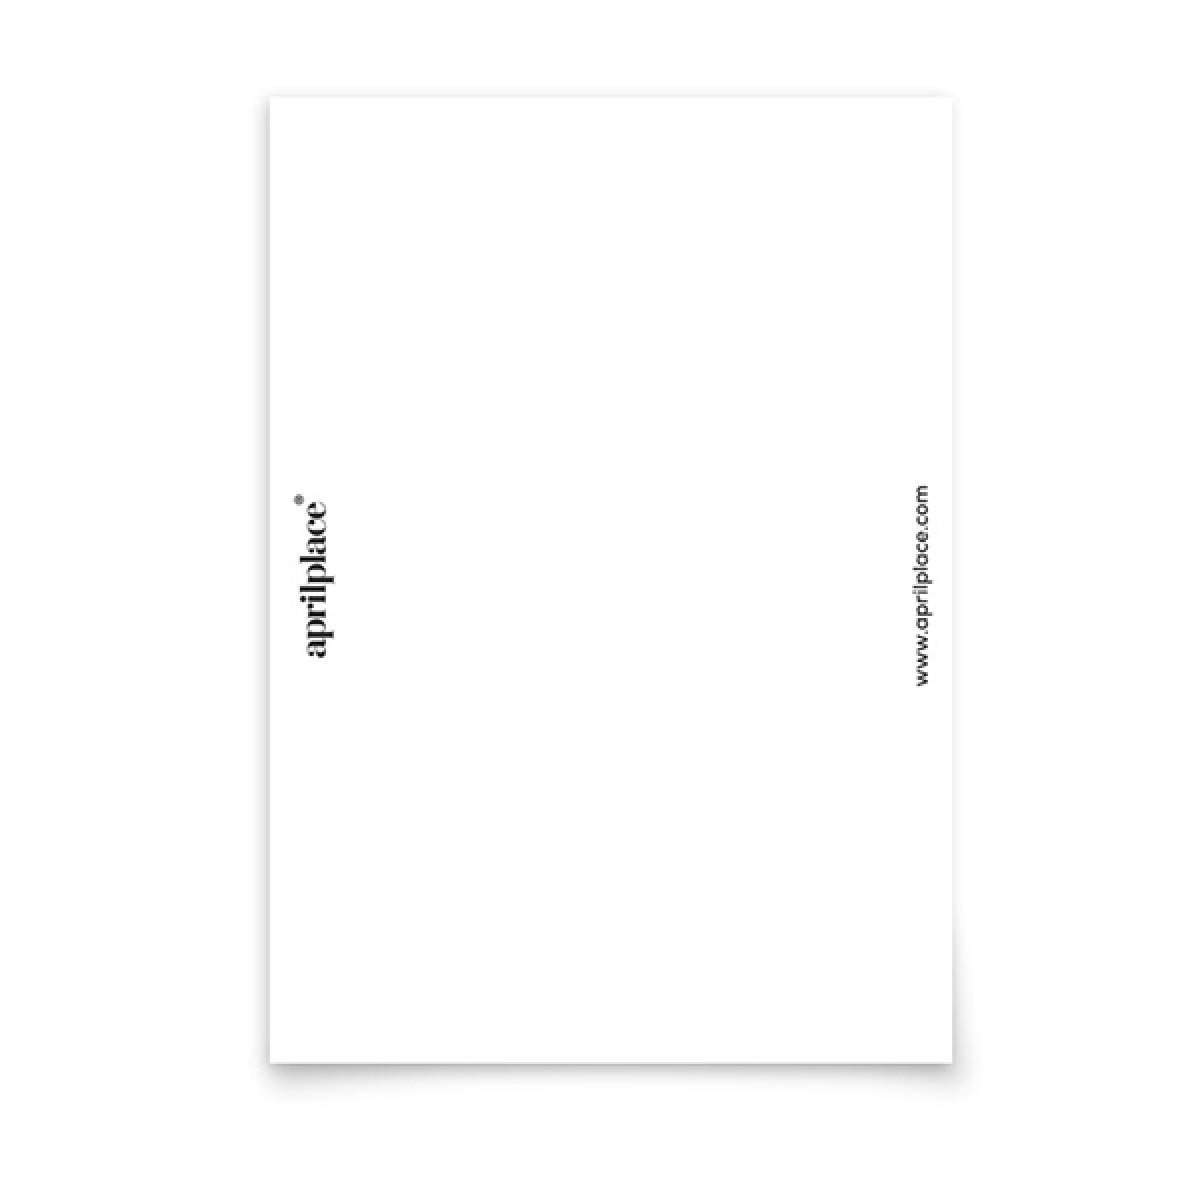 aprilplace // Smoothie // Postkarte Din A6